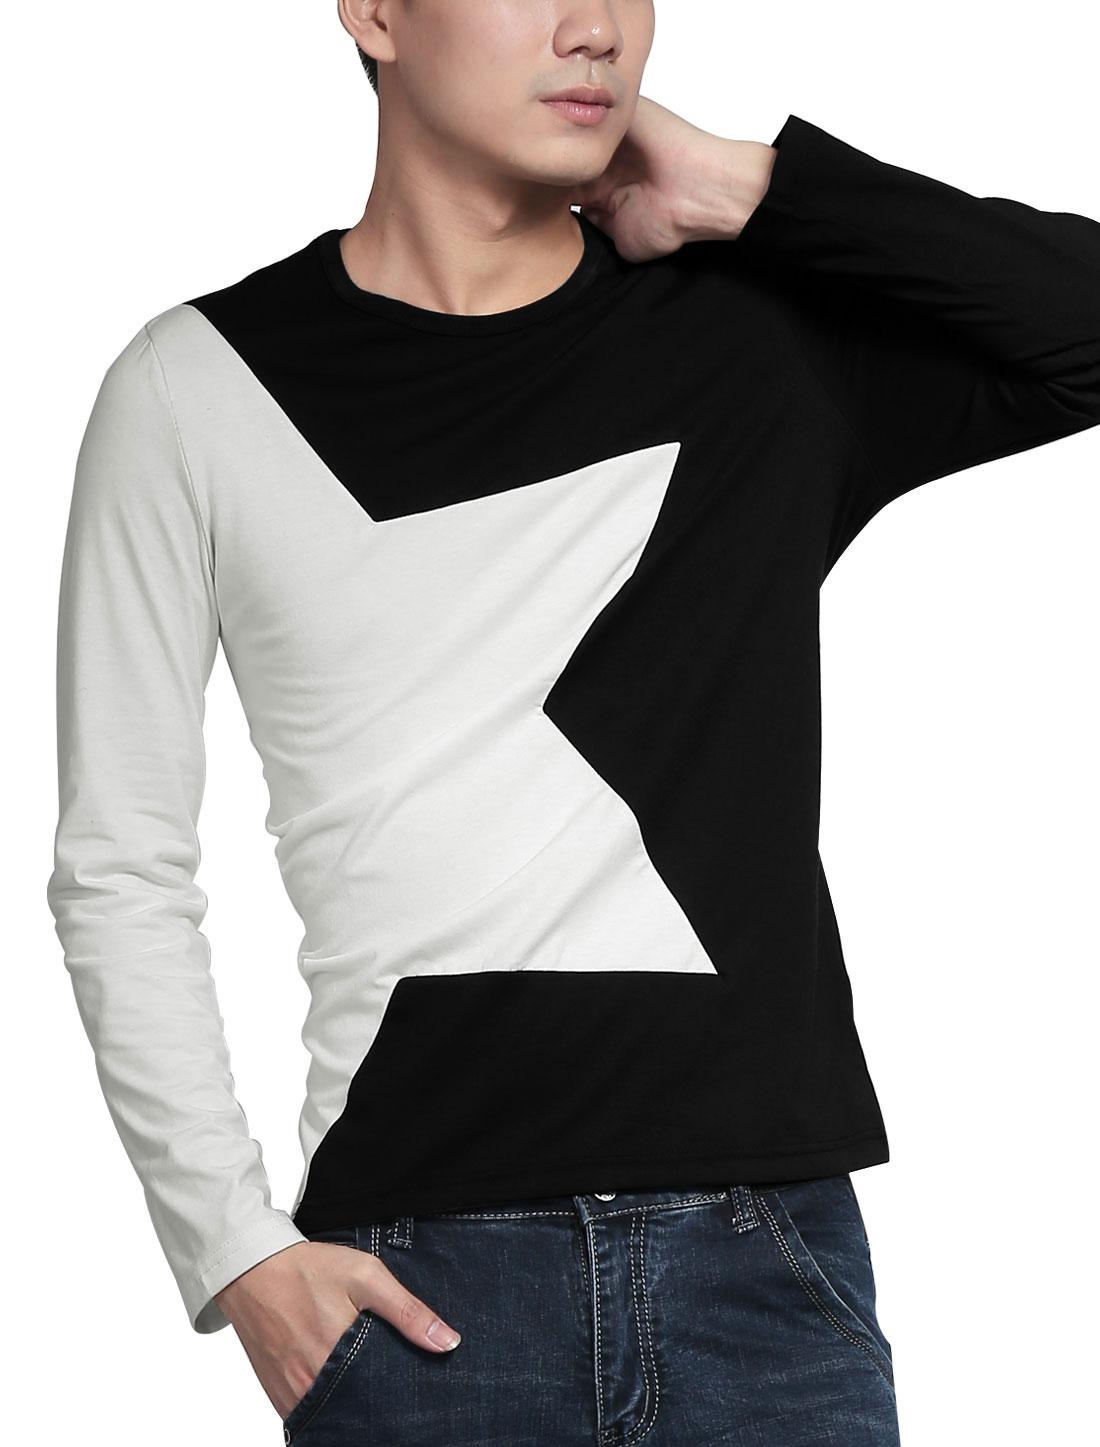 Men Autumn Fashion Long Sleeve Two-Tone Shirt Black White S